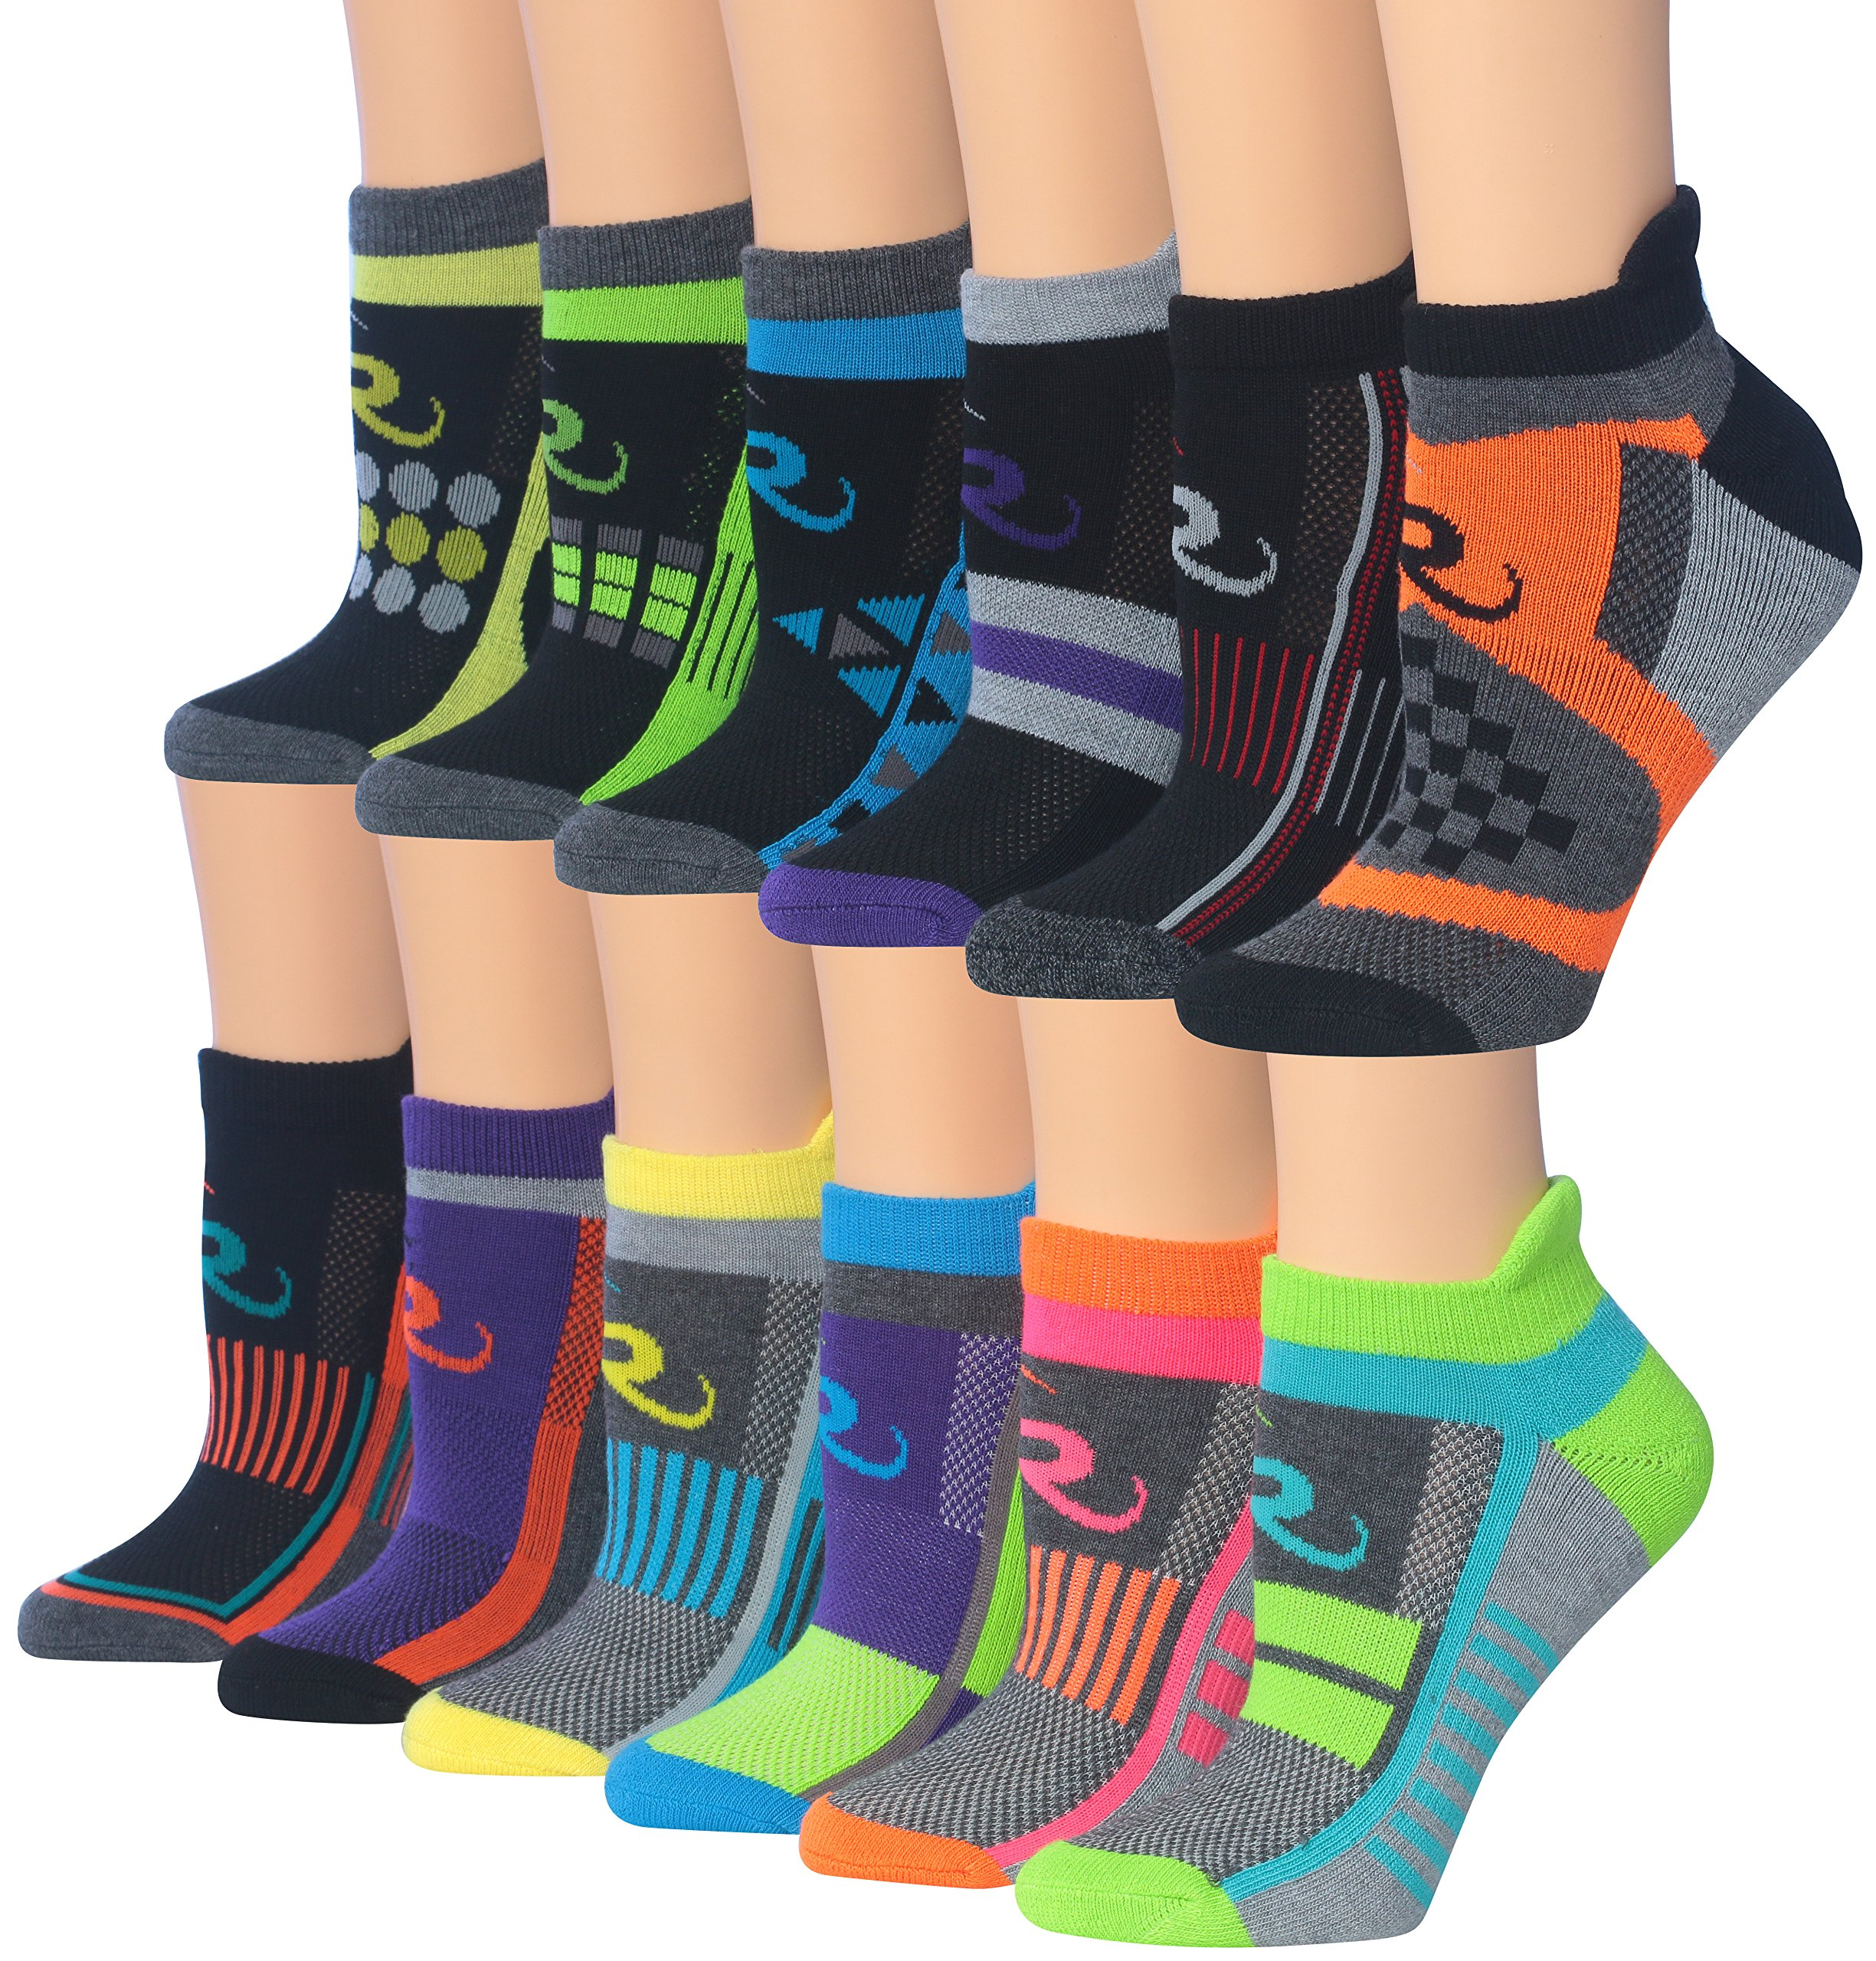 Ronnox Women's 12-Pairs Low Cut Running & Athletic Performance Socks Medium/Large RLT12-AB by RONNOX